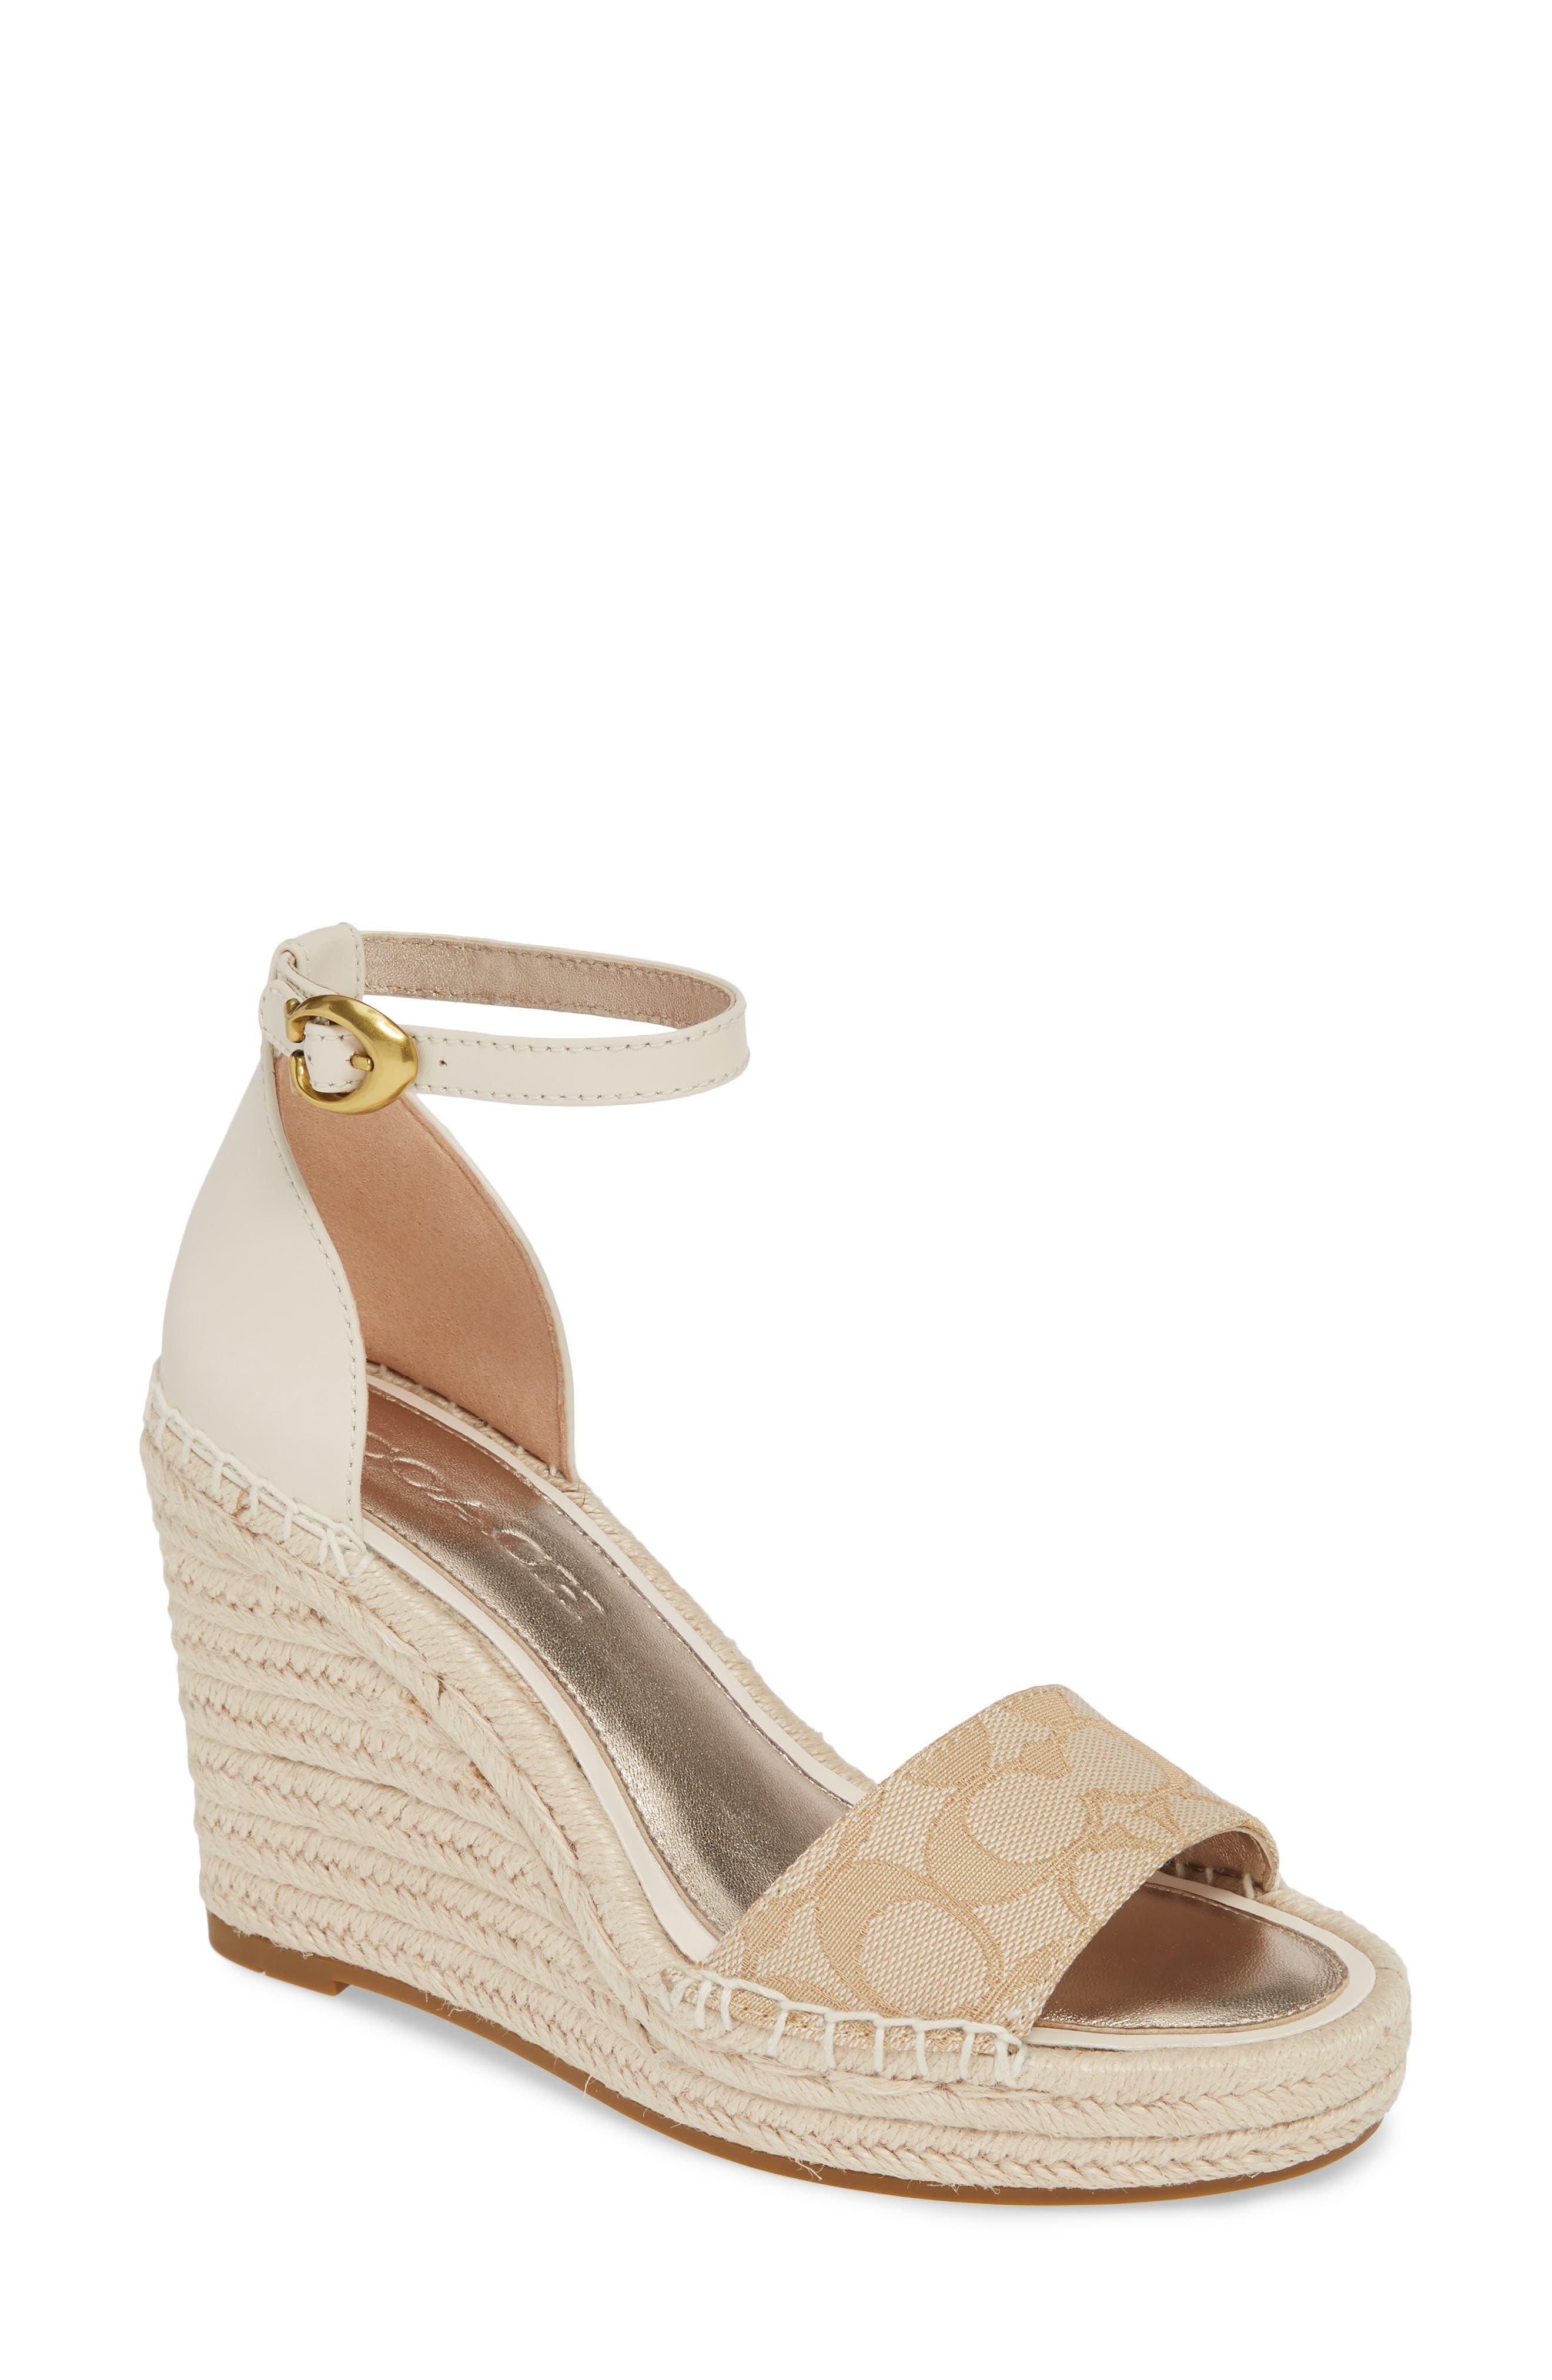 Coach Kit Espadrille Wedge Platform Sandal